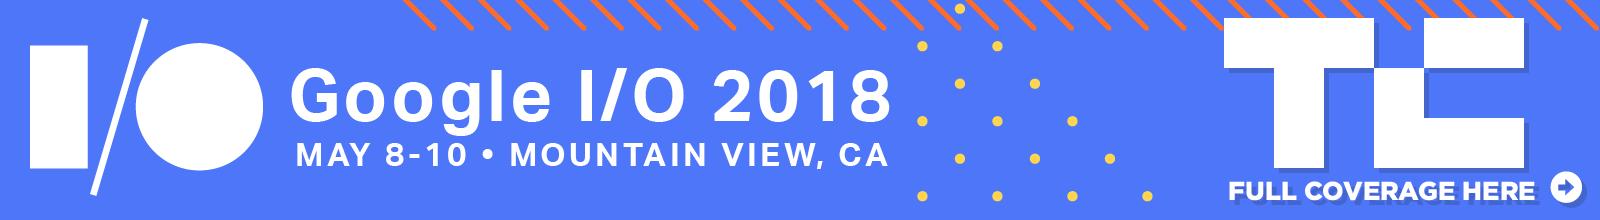 google io 2018 banner 5